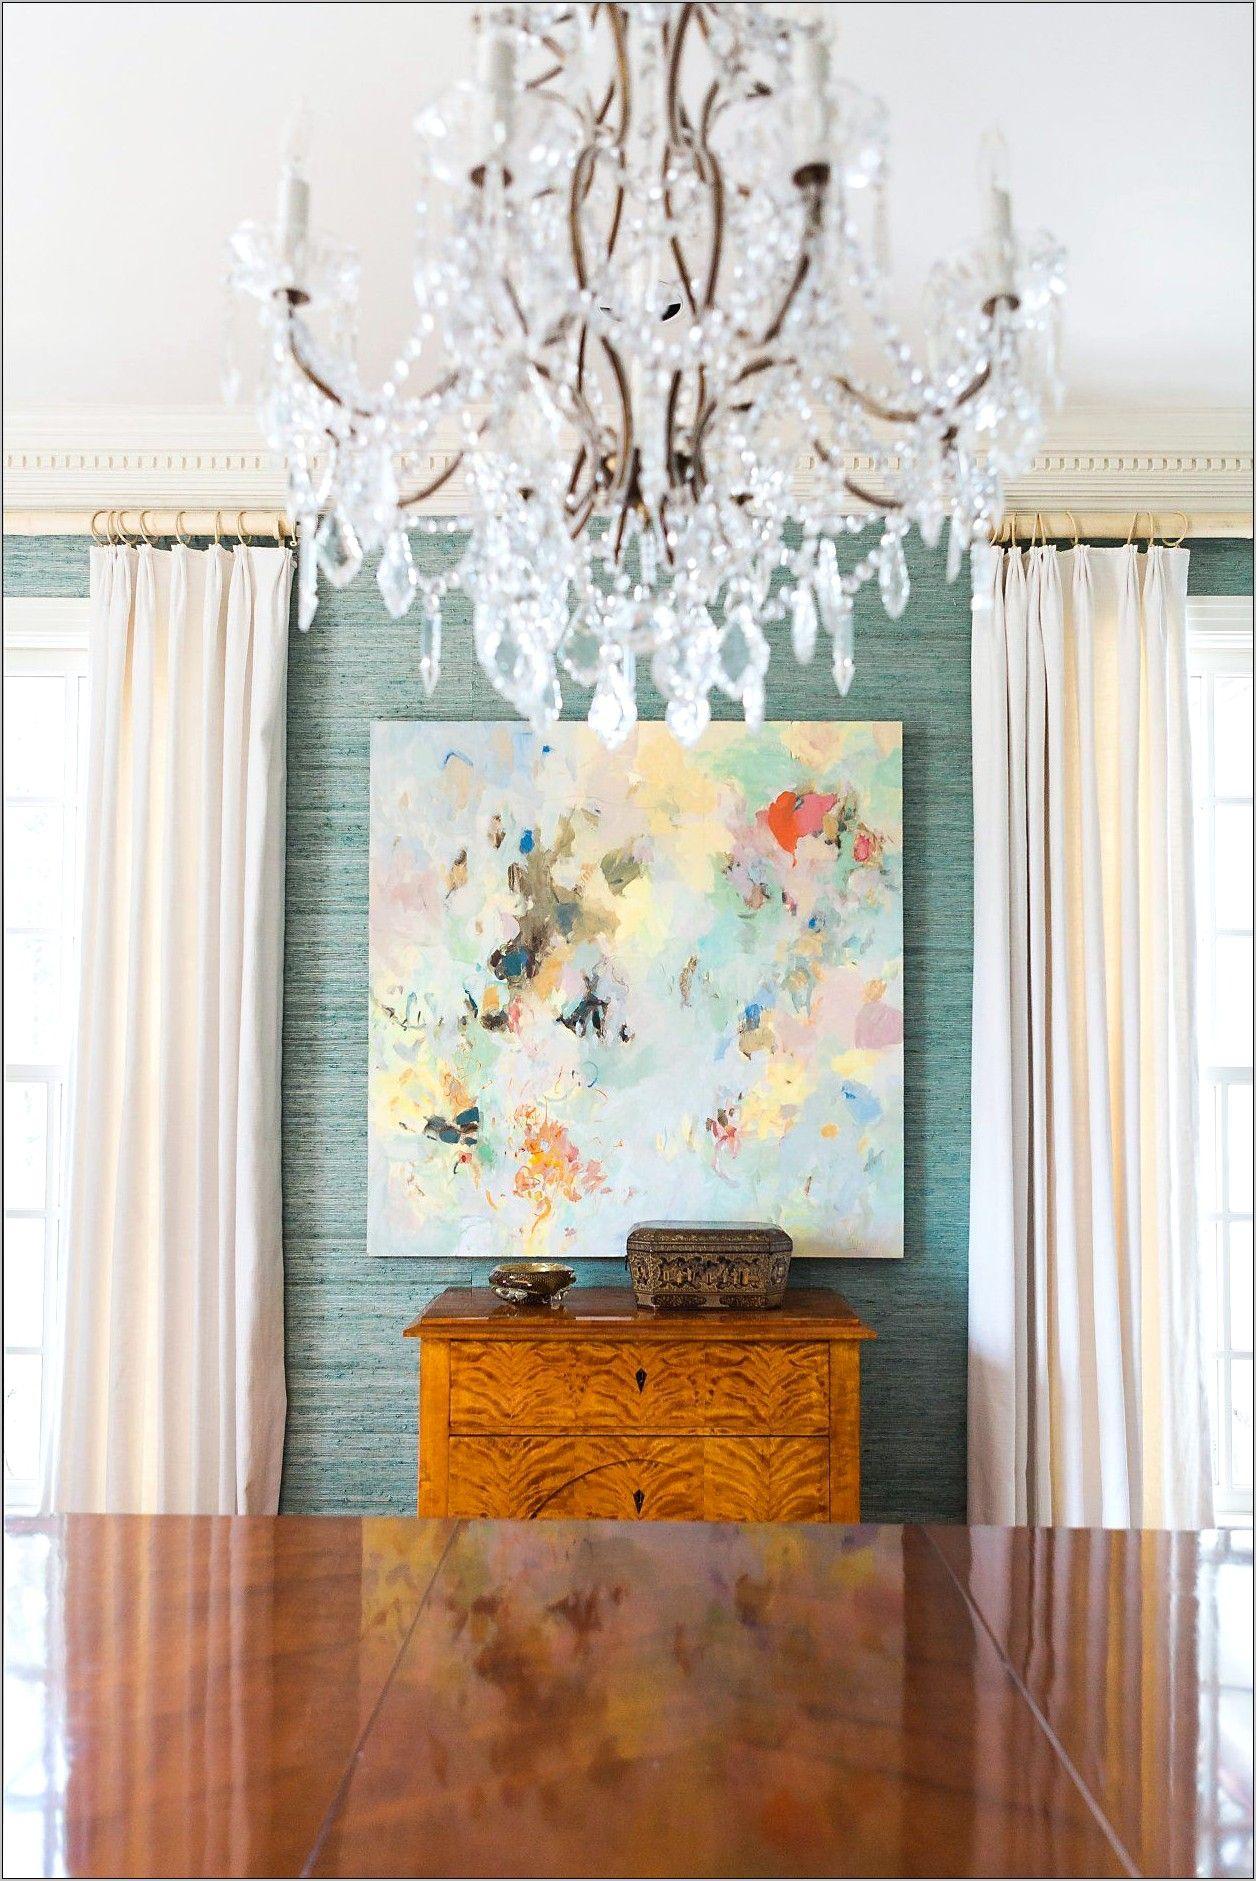 Grasscloth Wallpaper Dining Room Ideas In 2020 Grasscloth Wallpaper Dining Room Grasscloth Dining Room Dining Room Wallpaper